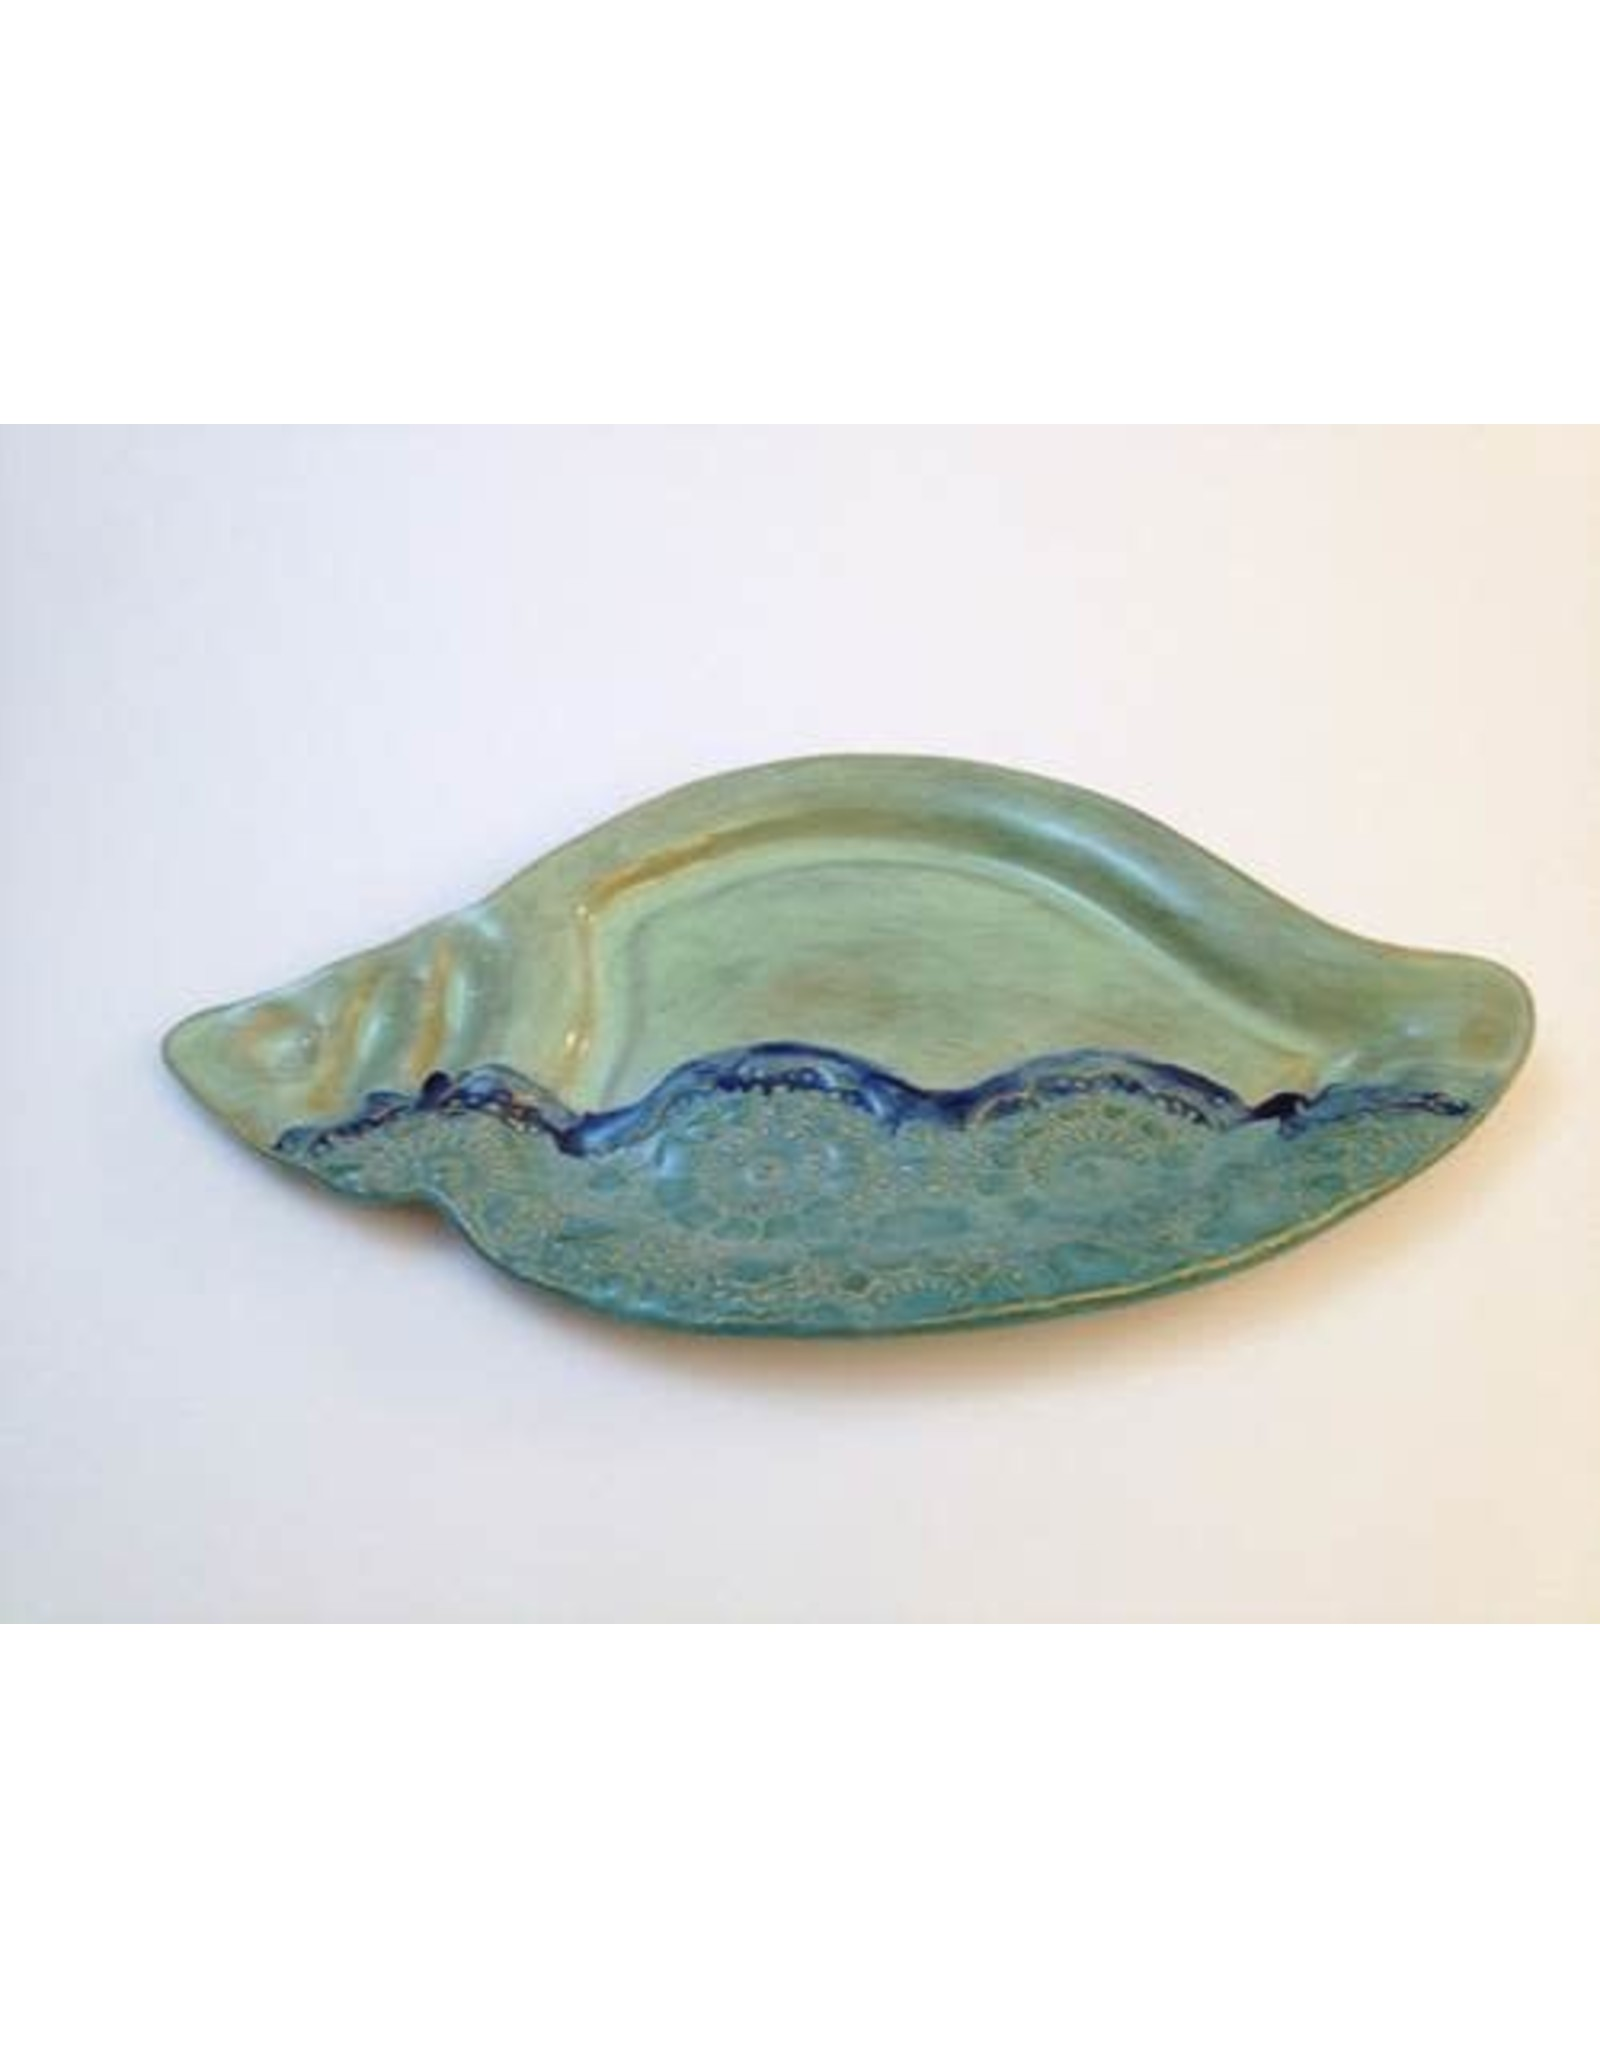 "Clarkware Pottery CONCH SHELL PLATTER 7x14"" (CLARK)"